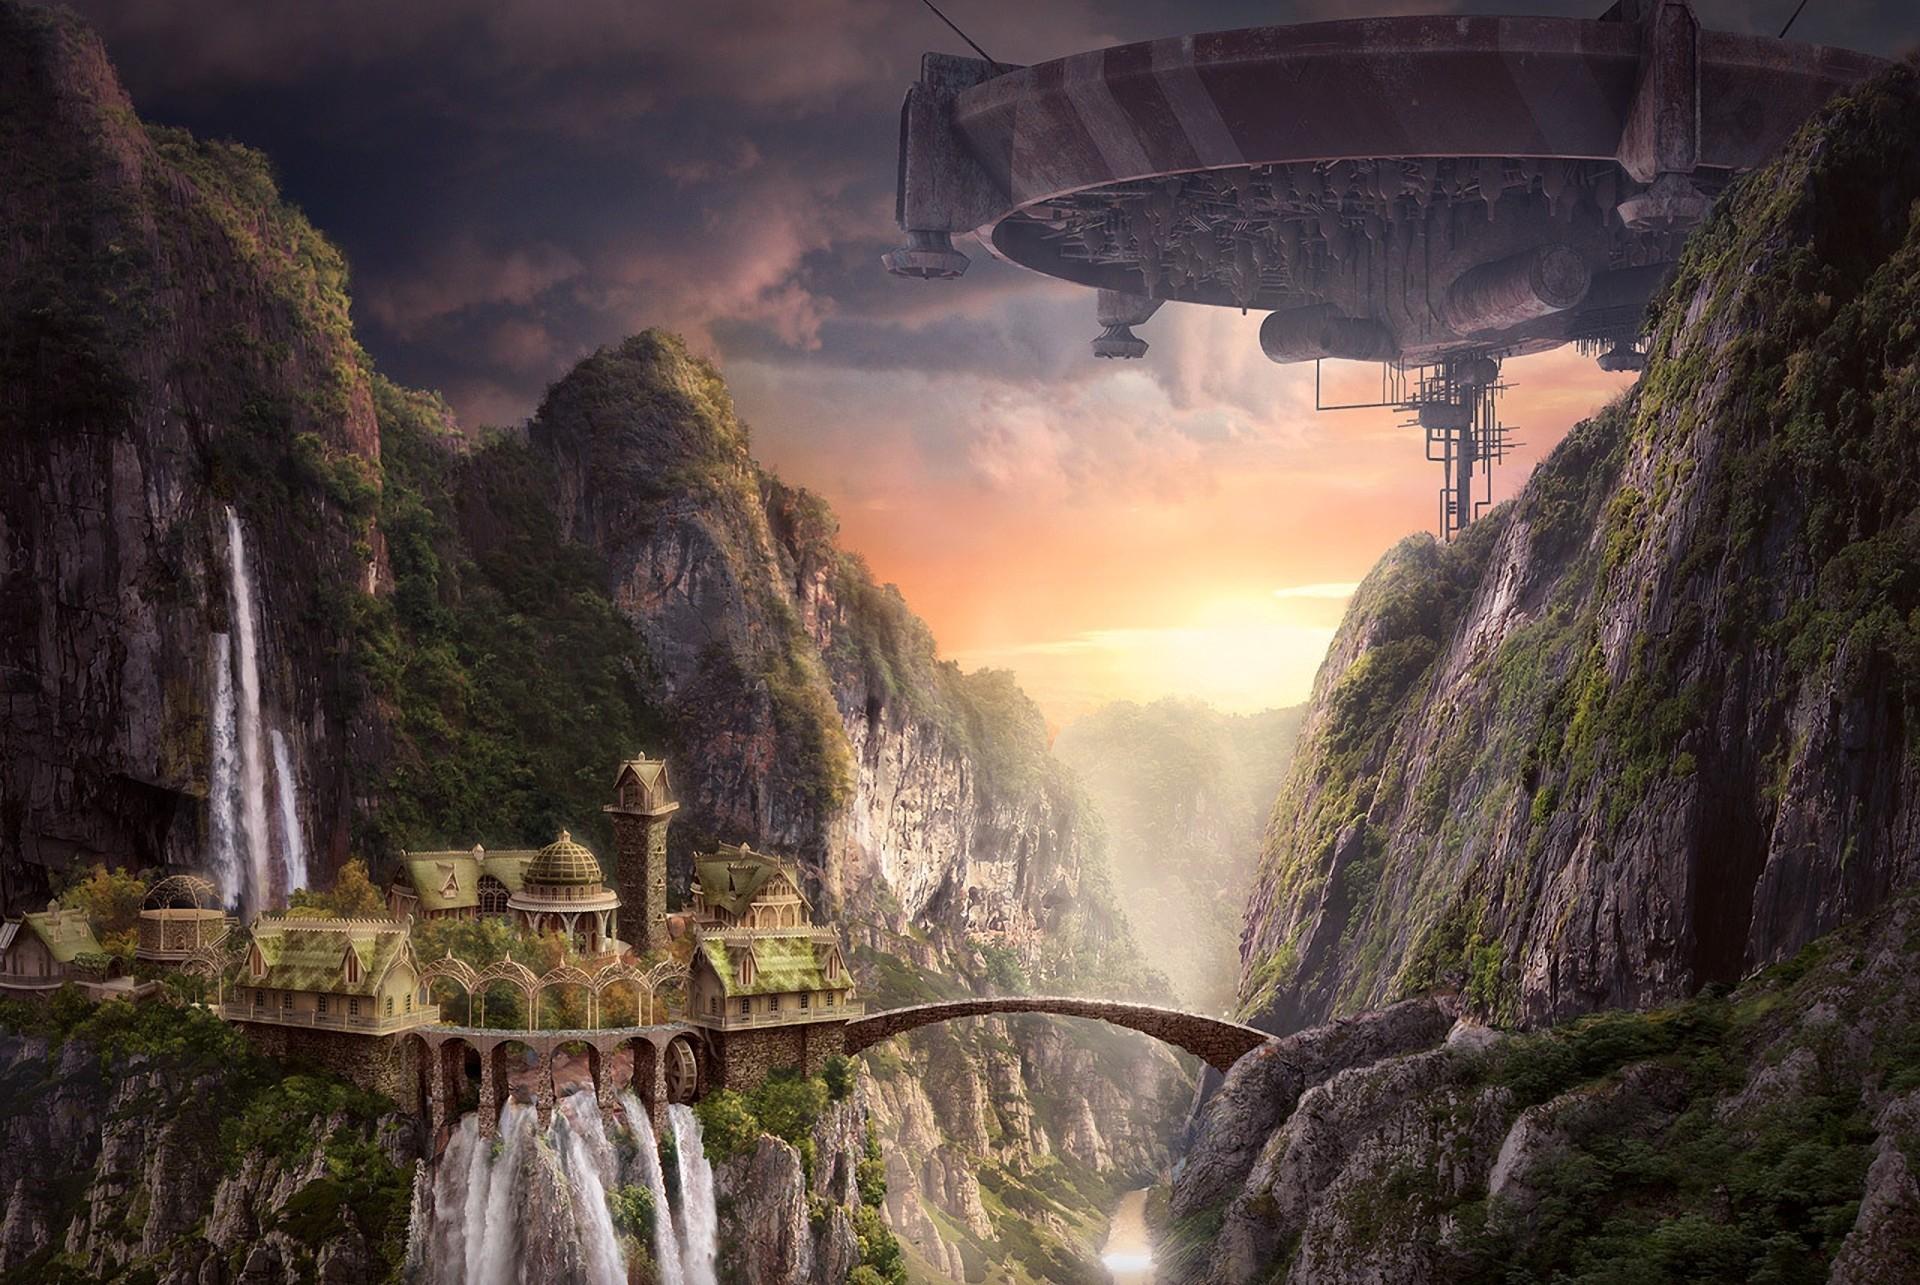 Bridge space ship wallpapers and images wallpapers - Fantasy wallpaper bridge ...